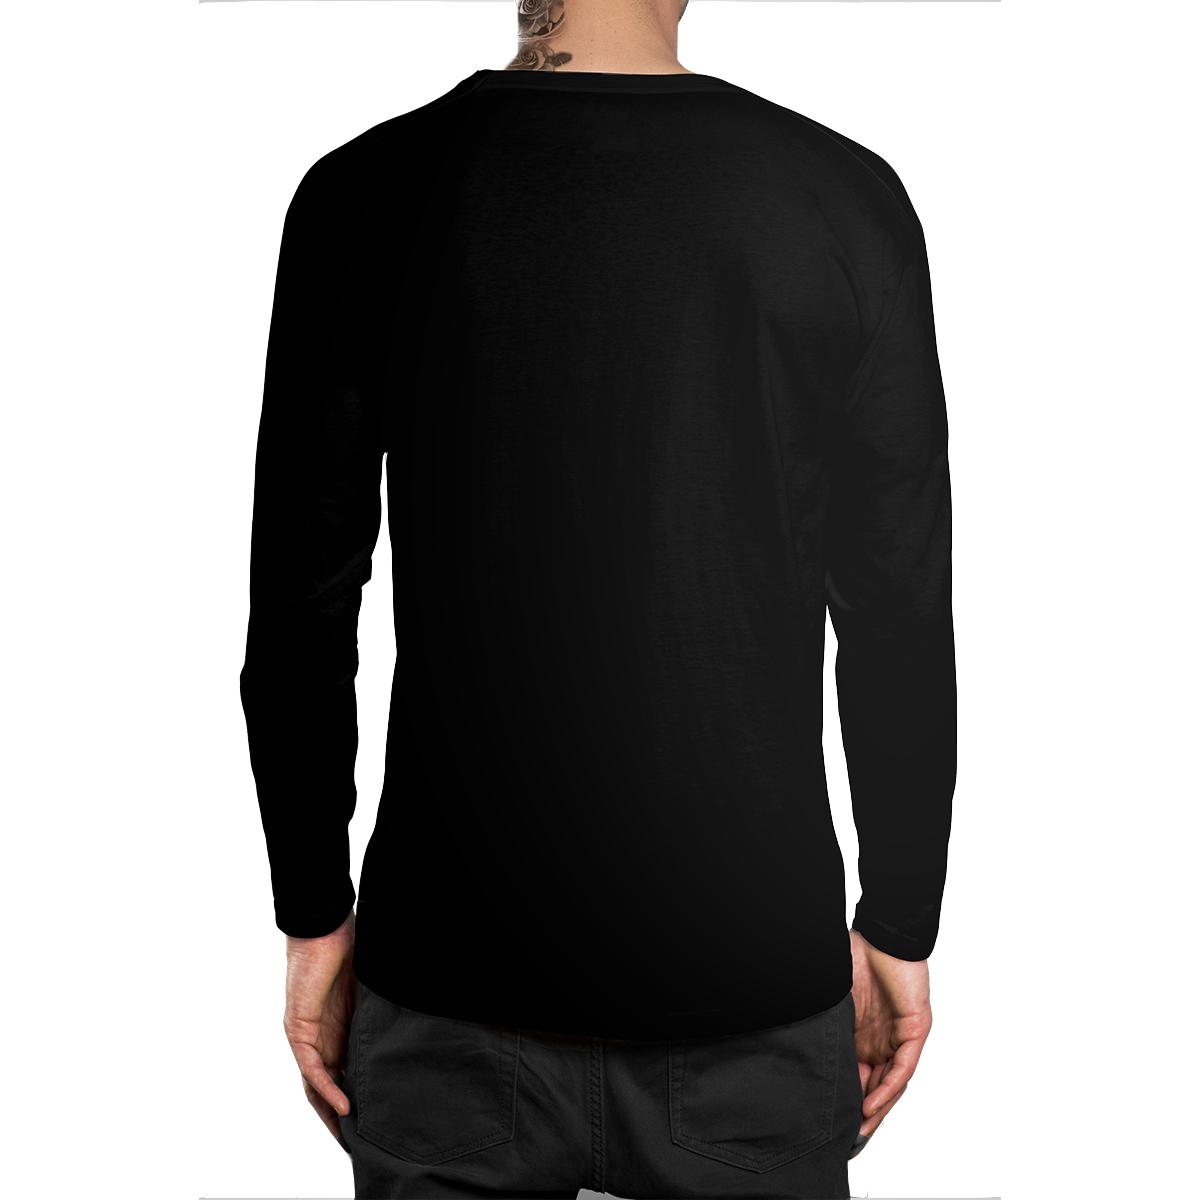 Stompy Camiseta Manga Longa Modelo 29